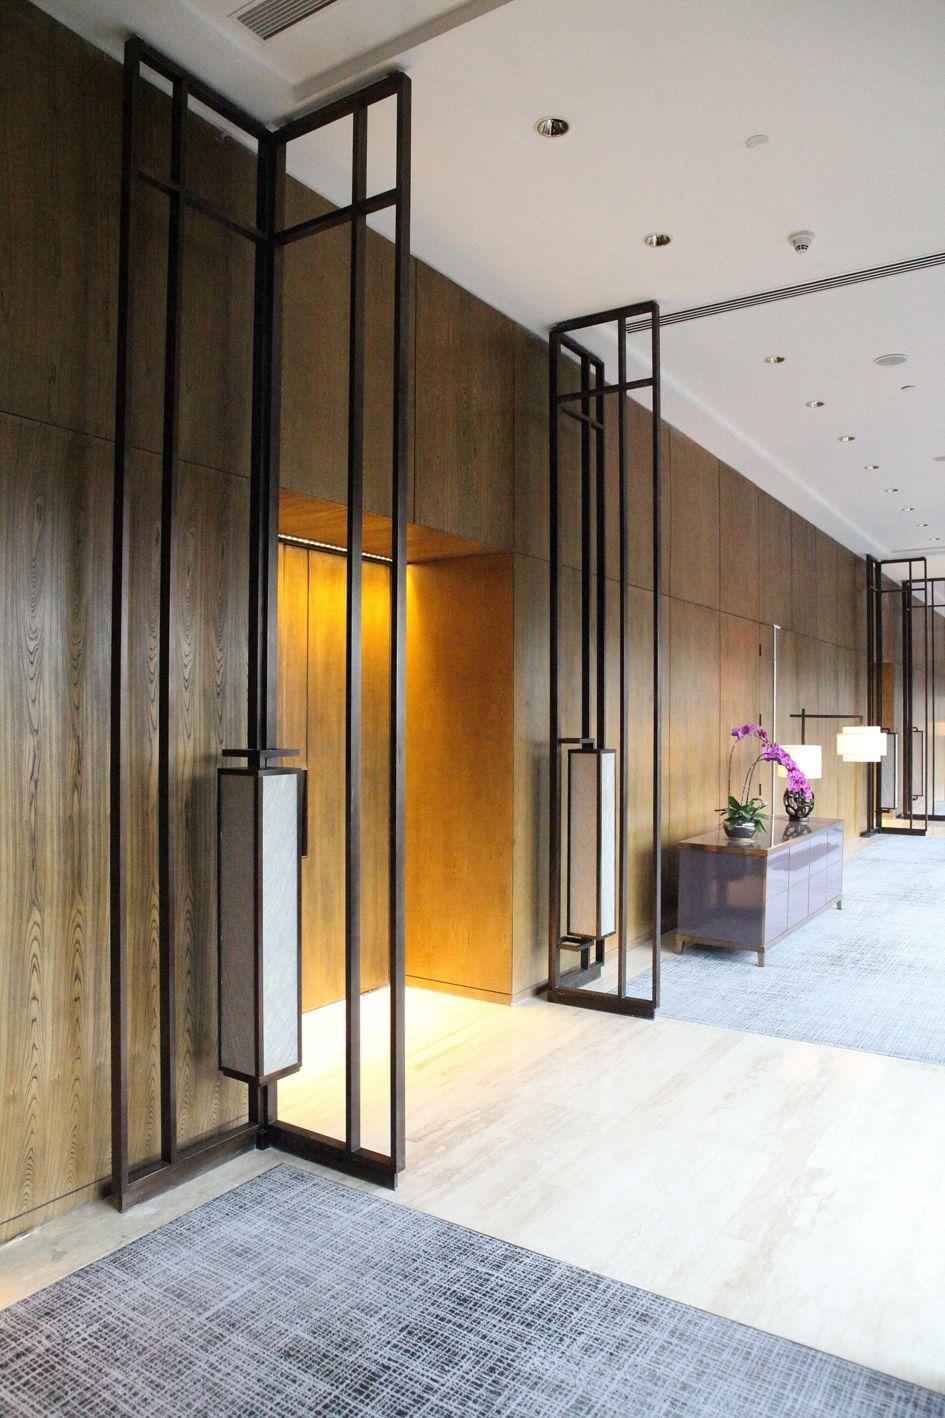 Küchen design hotel pin by paul broadley on ykl  pinterest  interiores celosías and